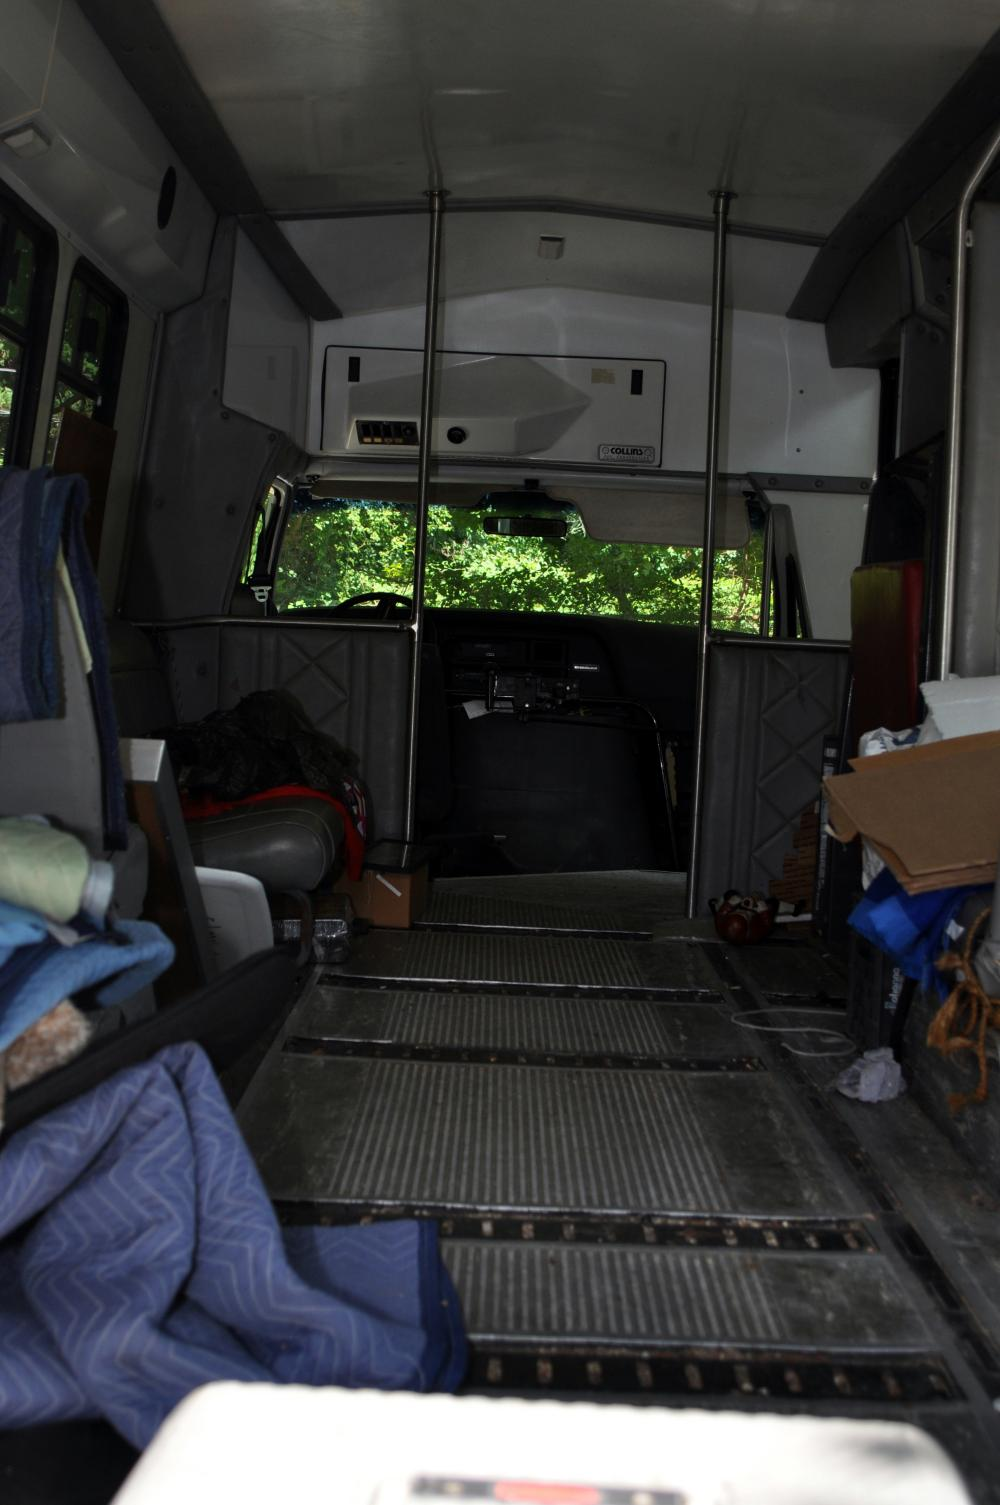 Lot 349: Bus Ford 1991 senior citizen bus